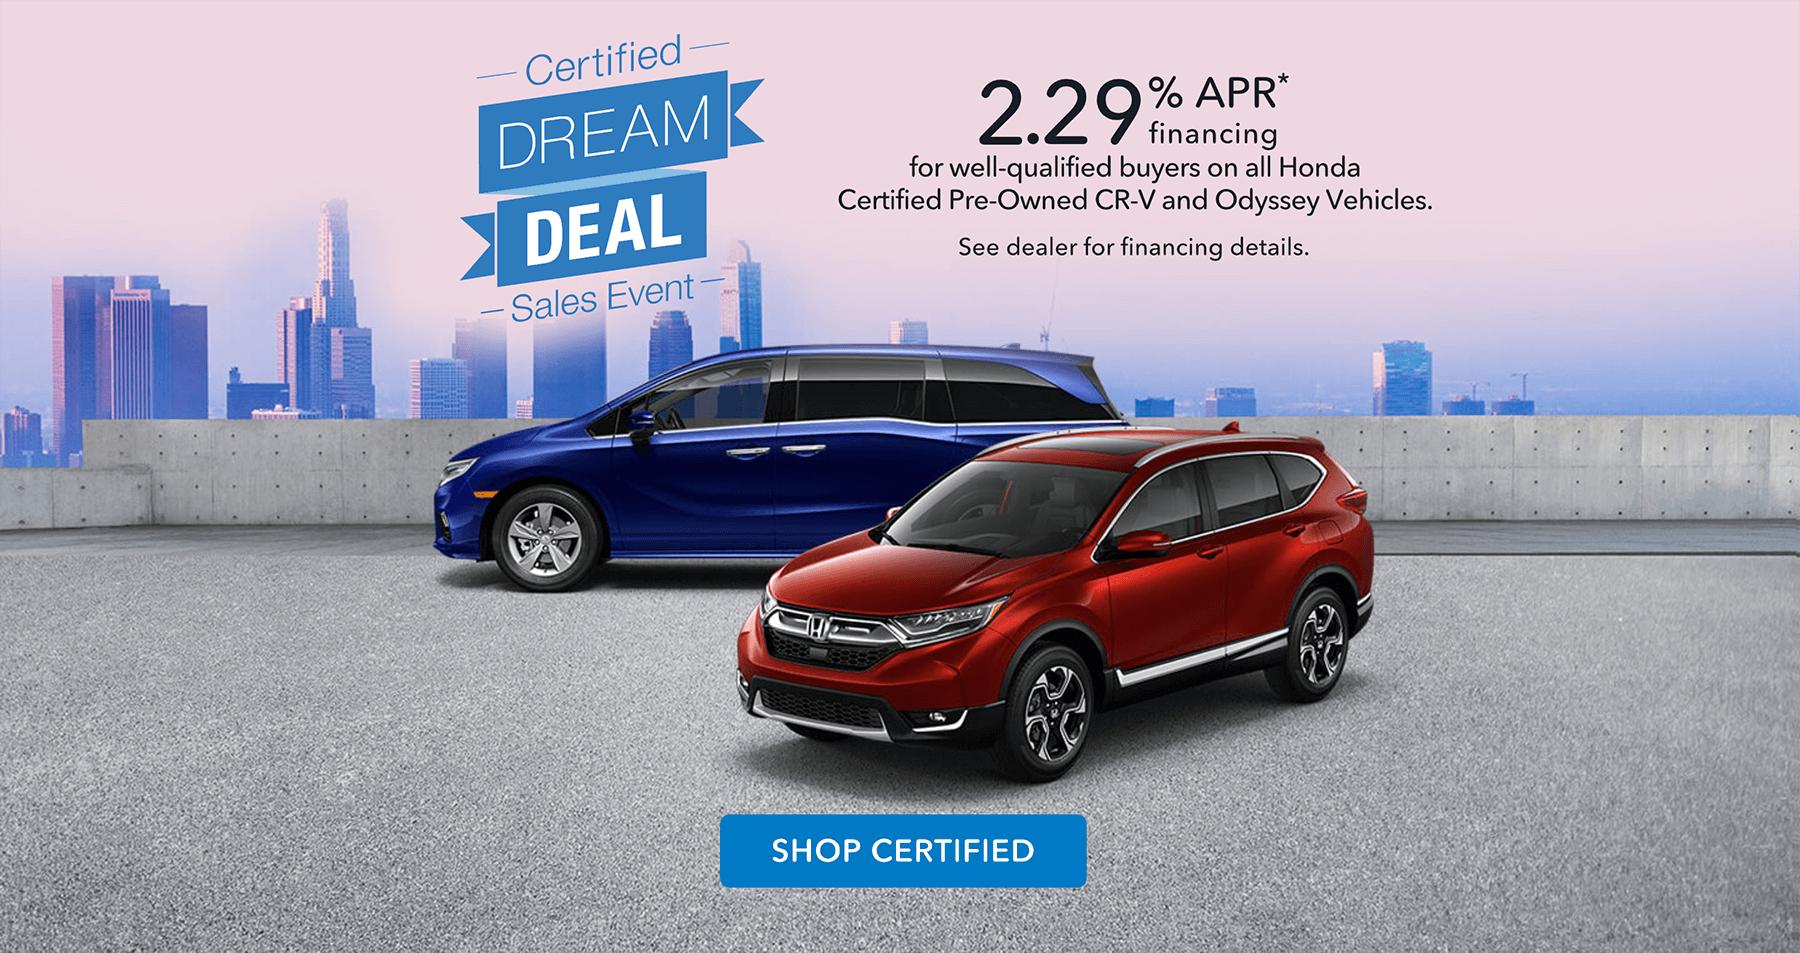 Honda Certified Pre Owned Financing >> Honda Certified Pre Owned Vehicles About Honda Cpo